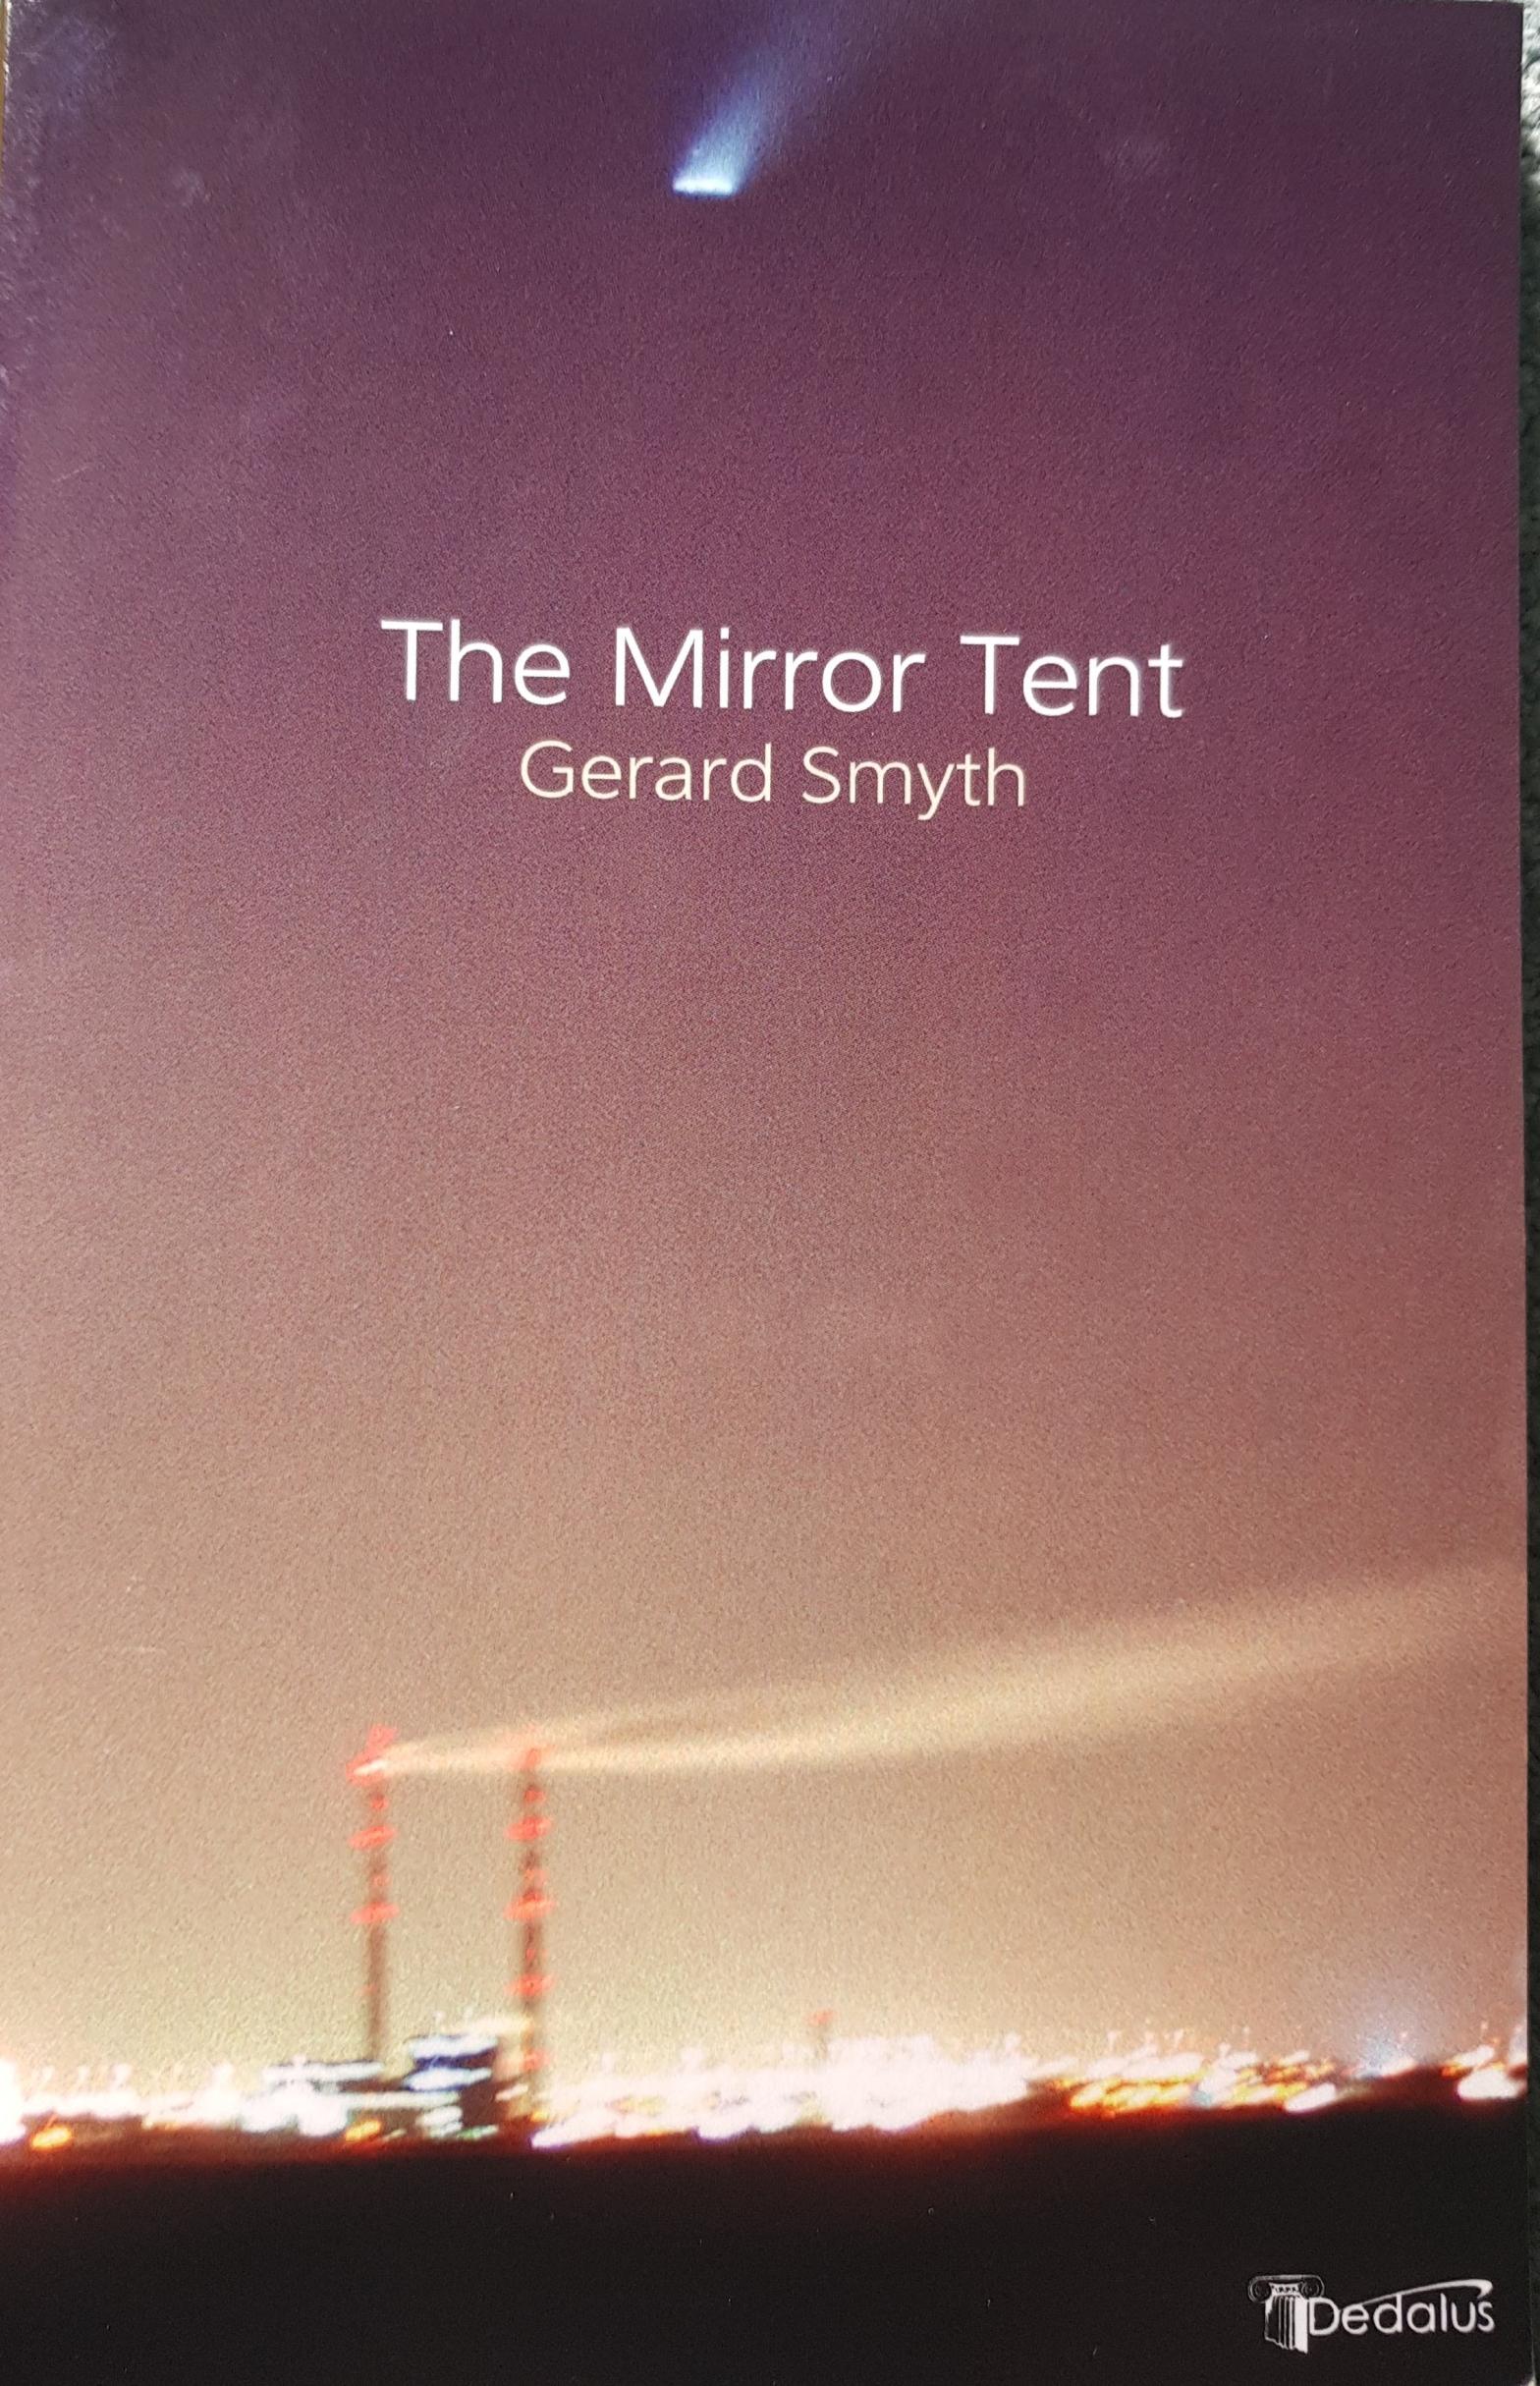 Gerard Smyth: The Mirror Tent